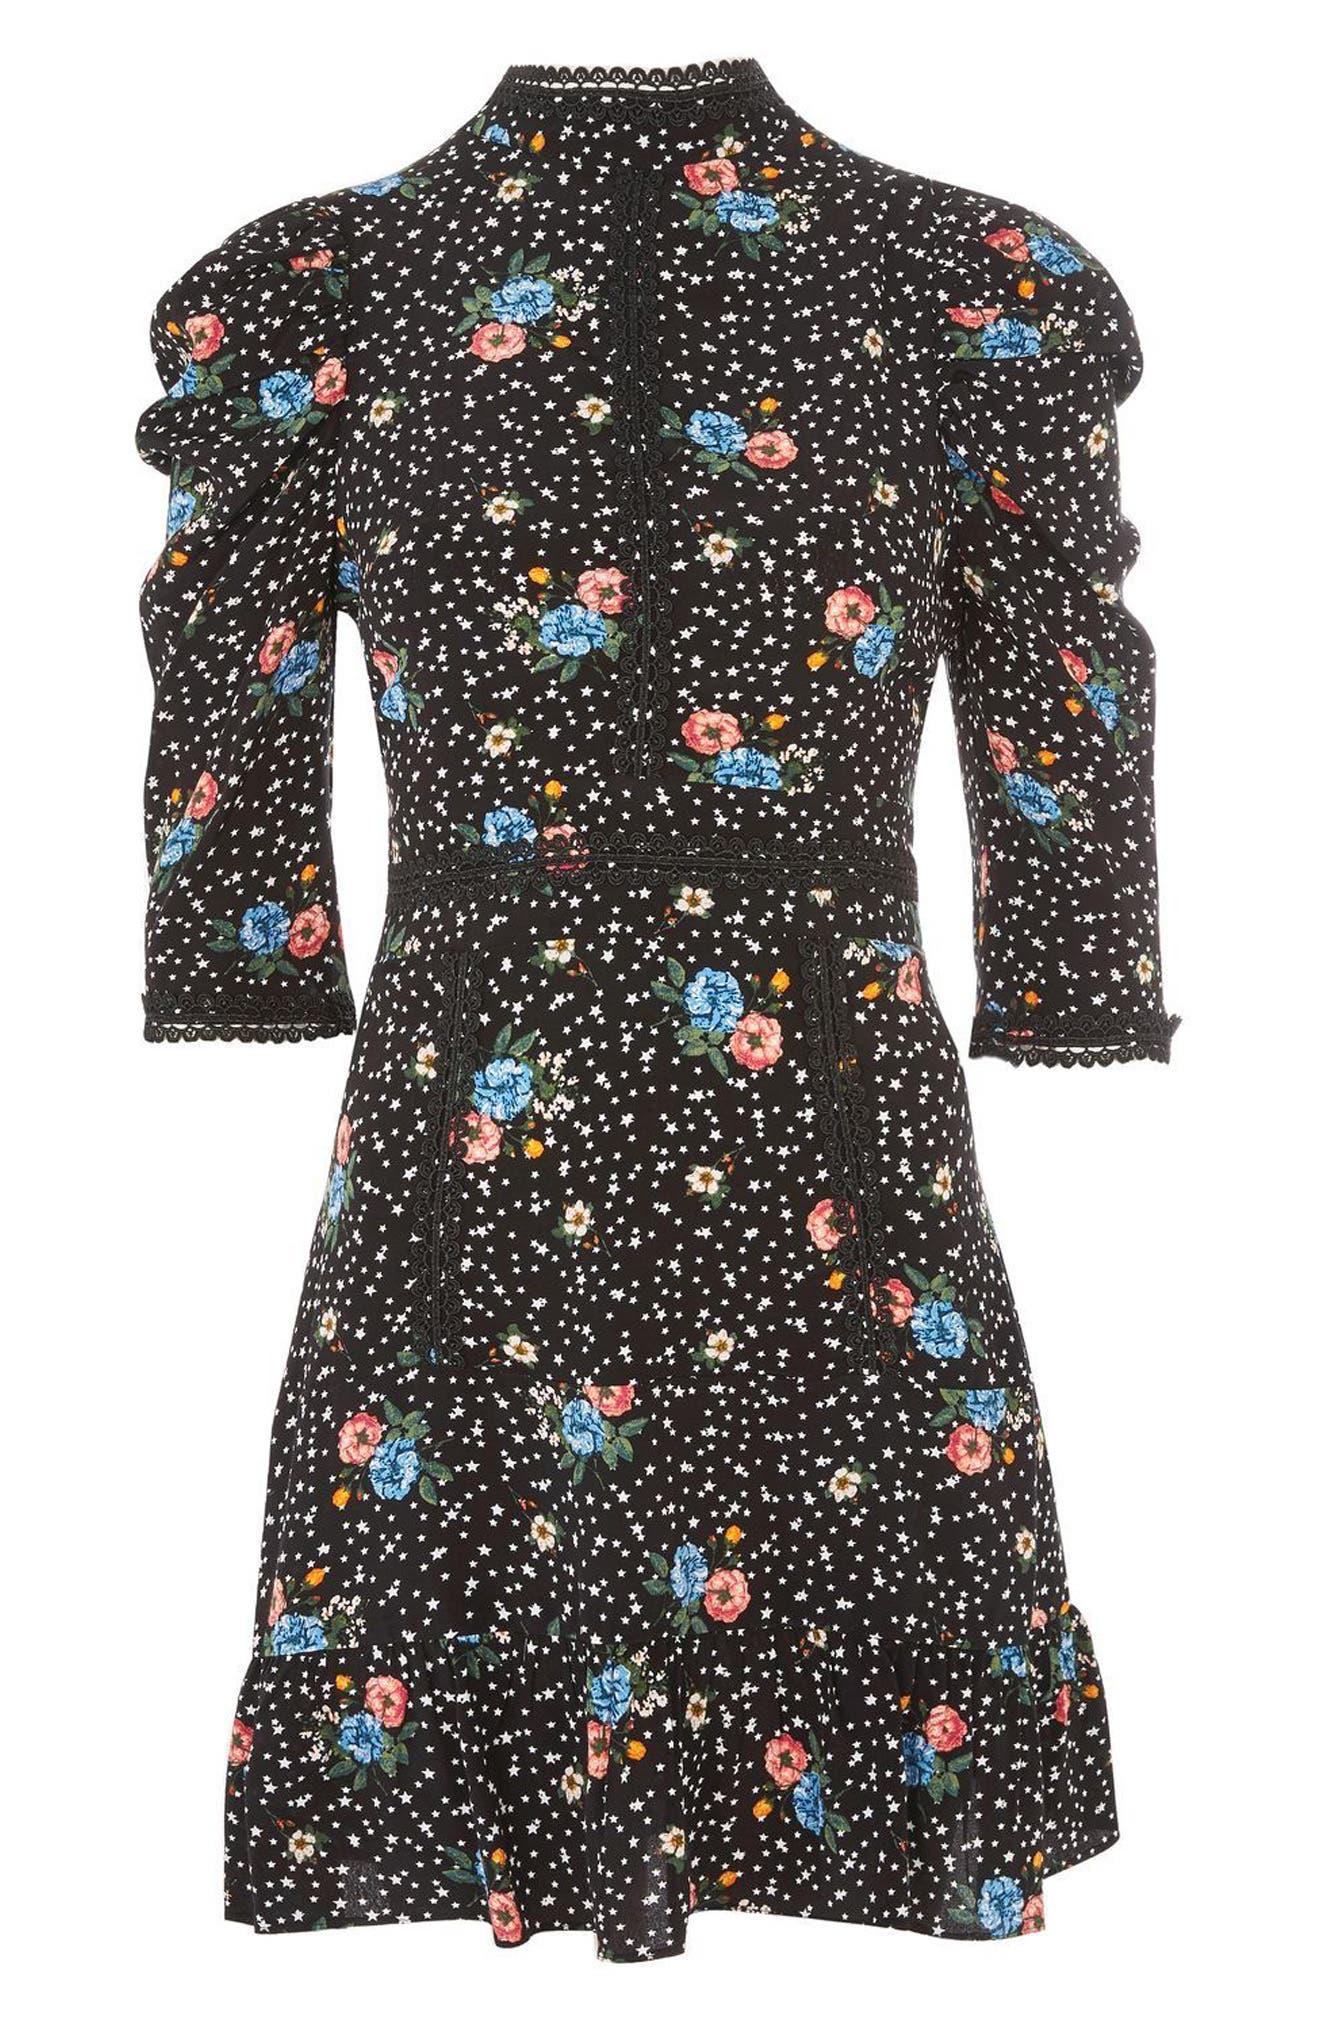 Lace-Up Back Floral Dress,                             Alternate thumbnail 4, color,                             001